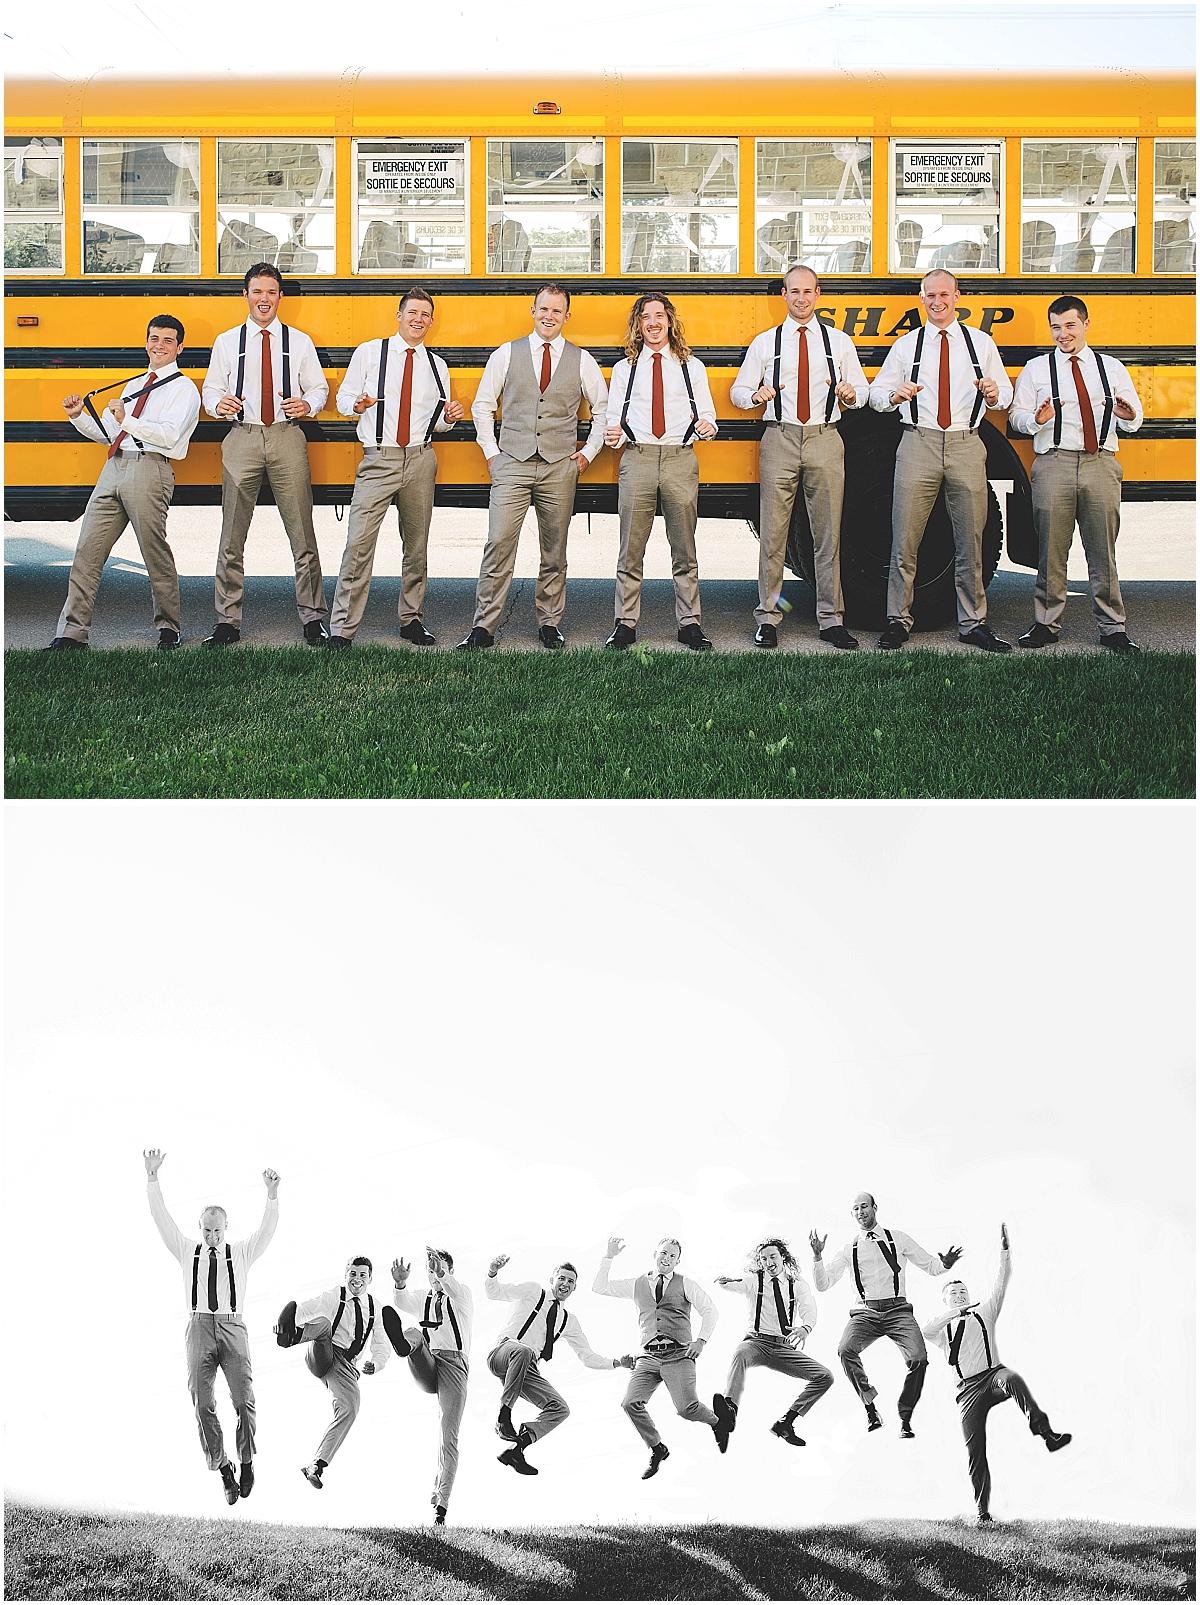 fun groomsmen photos by Bobbi-Jo Stuart of Love Bee Photography